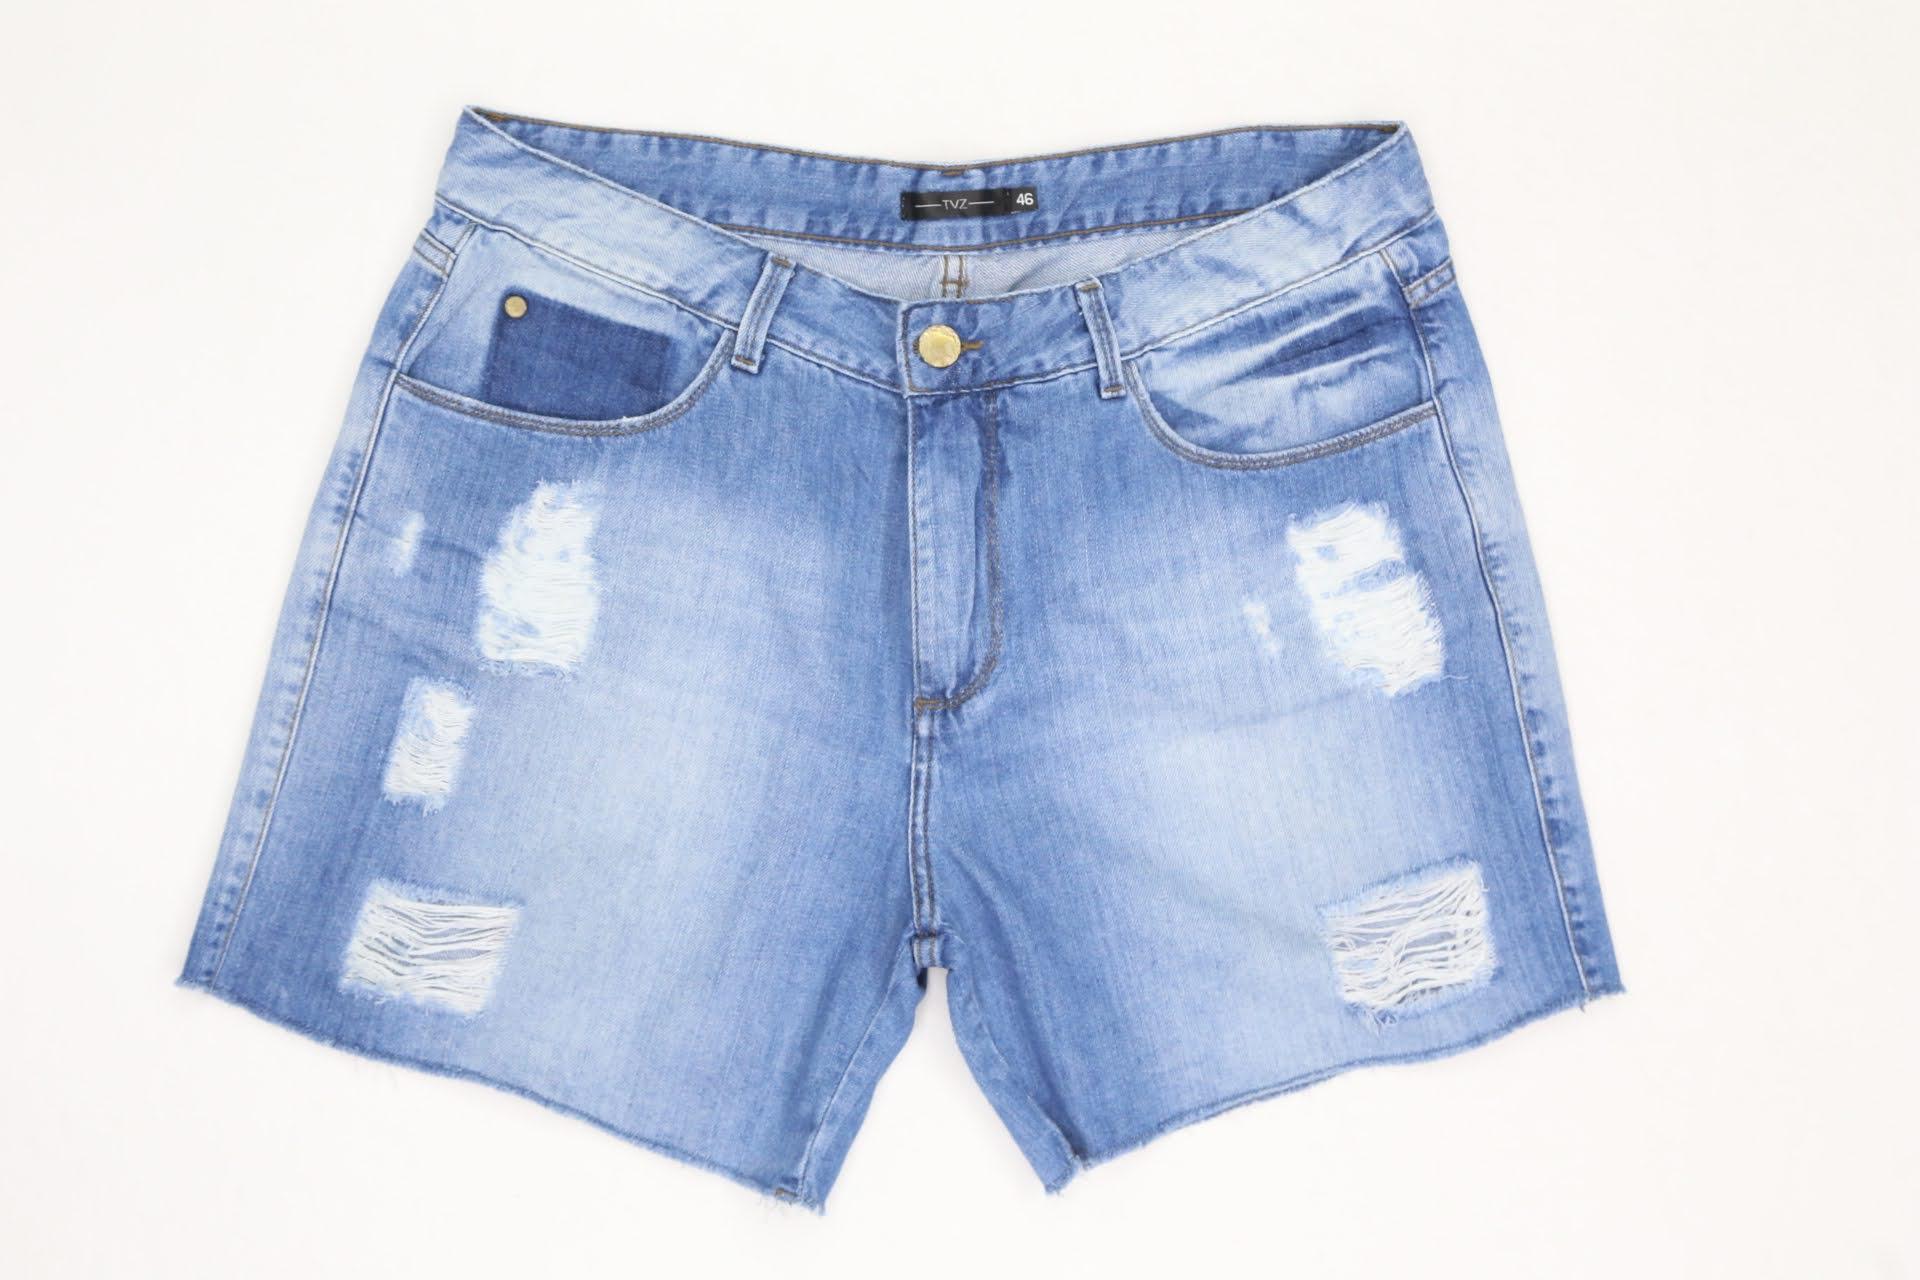 Short jeans - TVZ - 46